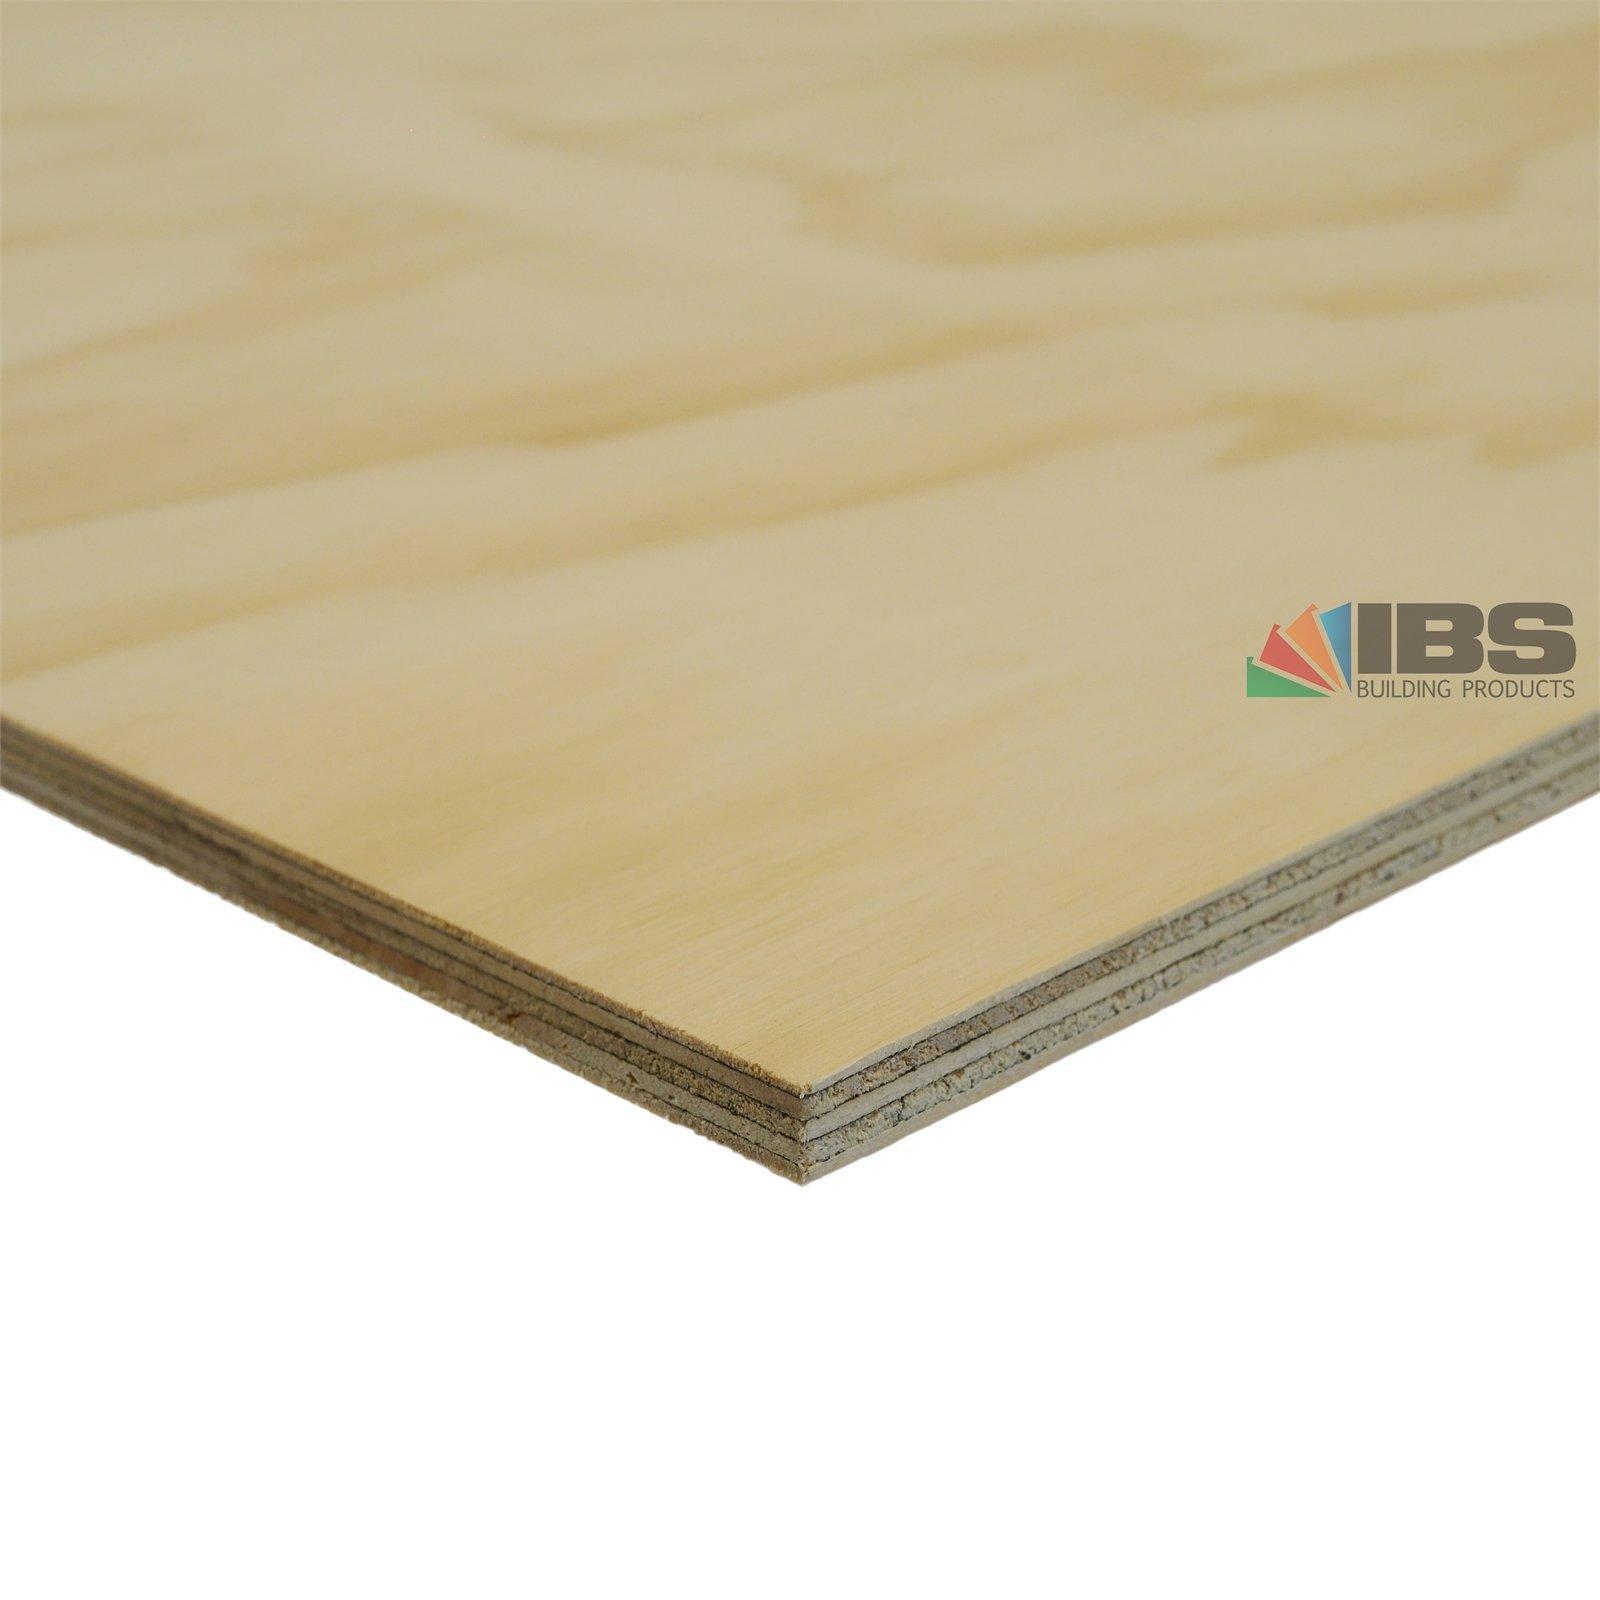 IBS Mini Panels 1200 x 1200 x 12mm Untreated CD Plywood